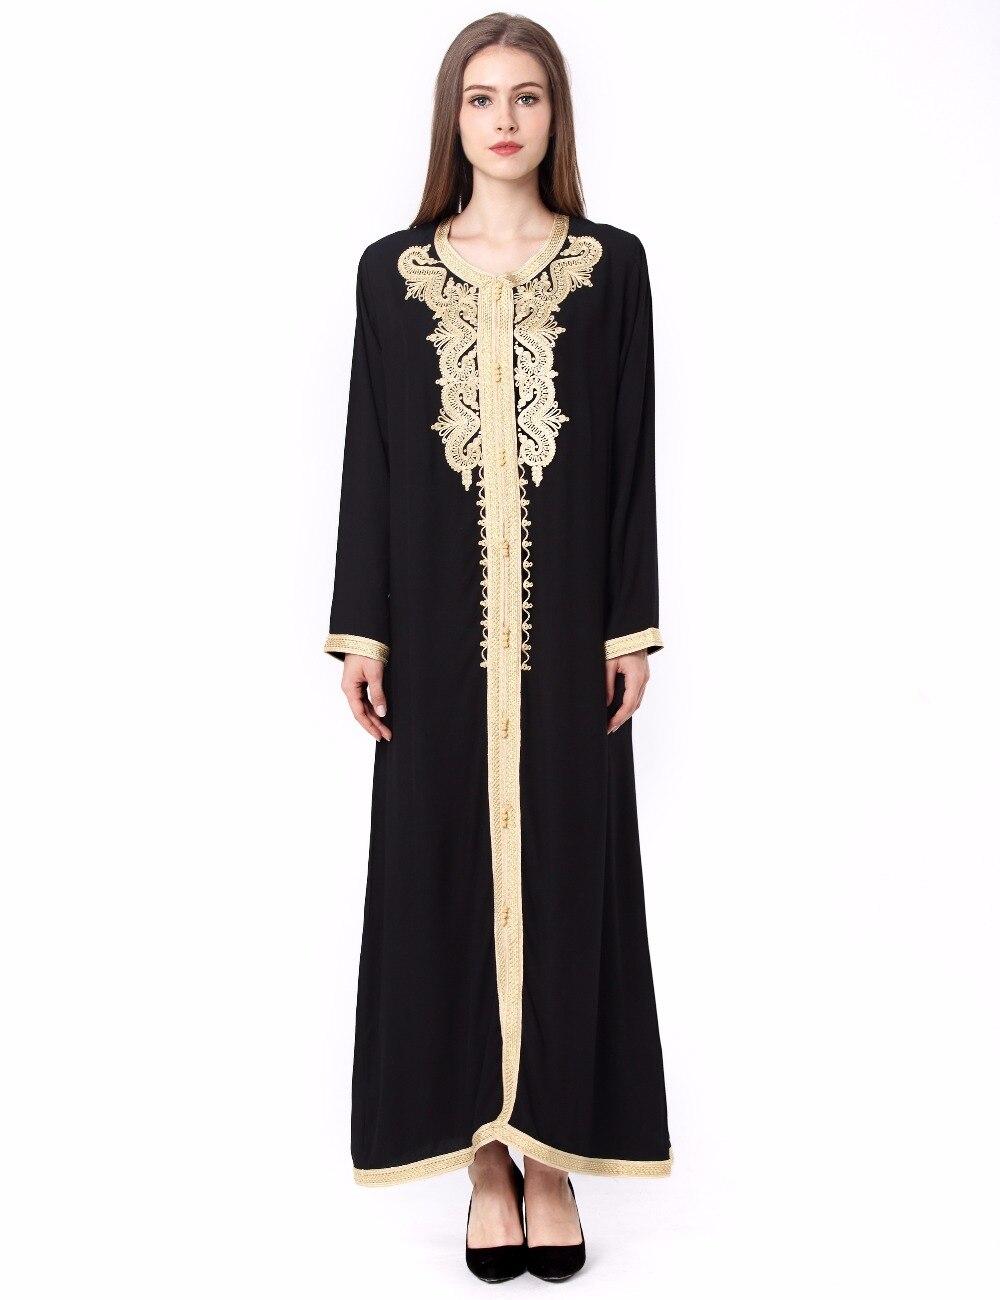 89ebce8f51 Women Maxi Long sleeve long Dress embroidery moroccan Kaftan Caftan Jilbab  Islamic abaya Muslim Turkish arabic Robes gown 1629-in Dresses from Women s  ...